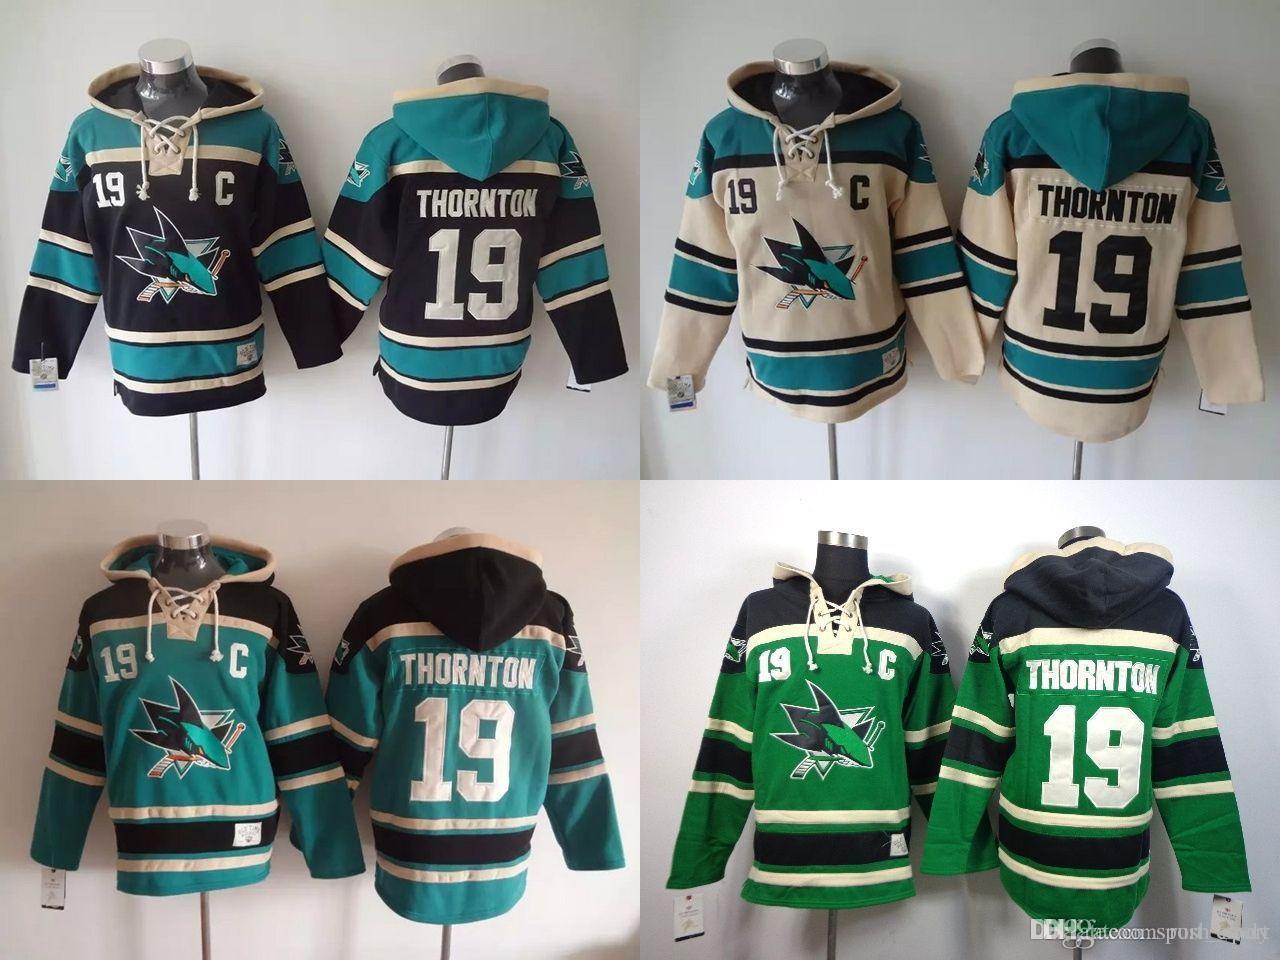 2018 San Jose Sharks Hoodies Cheap Hockey Jerseys Hoody Sweatshirts Thornton #19 Green Blue Cream Black From Rush_sport, $32.03 | Dhgate.Com